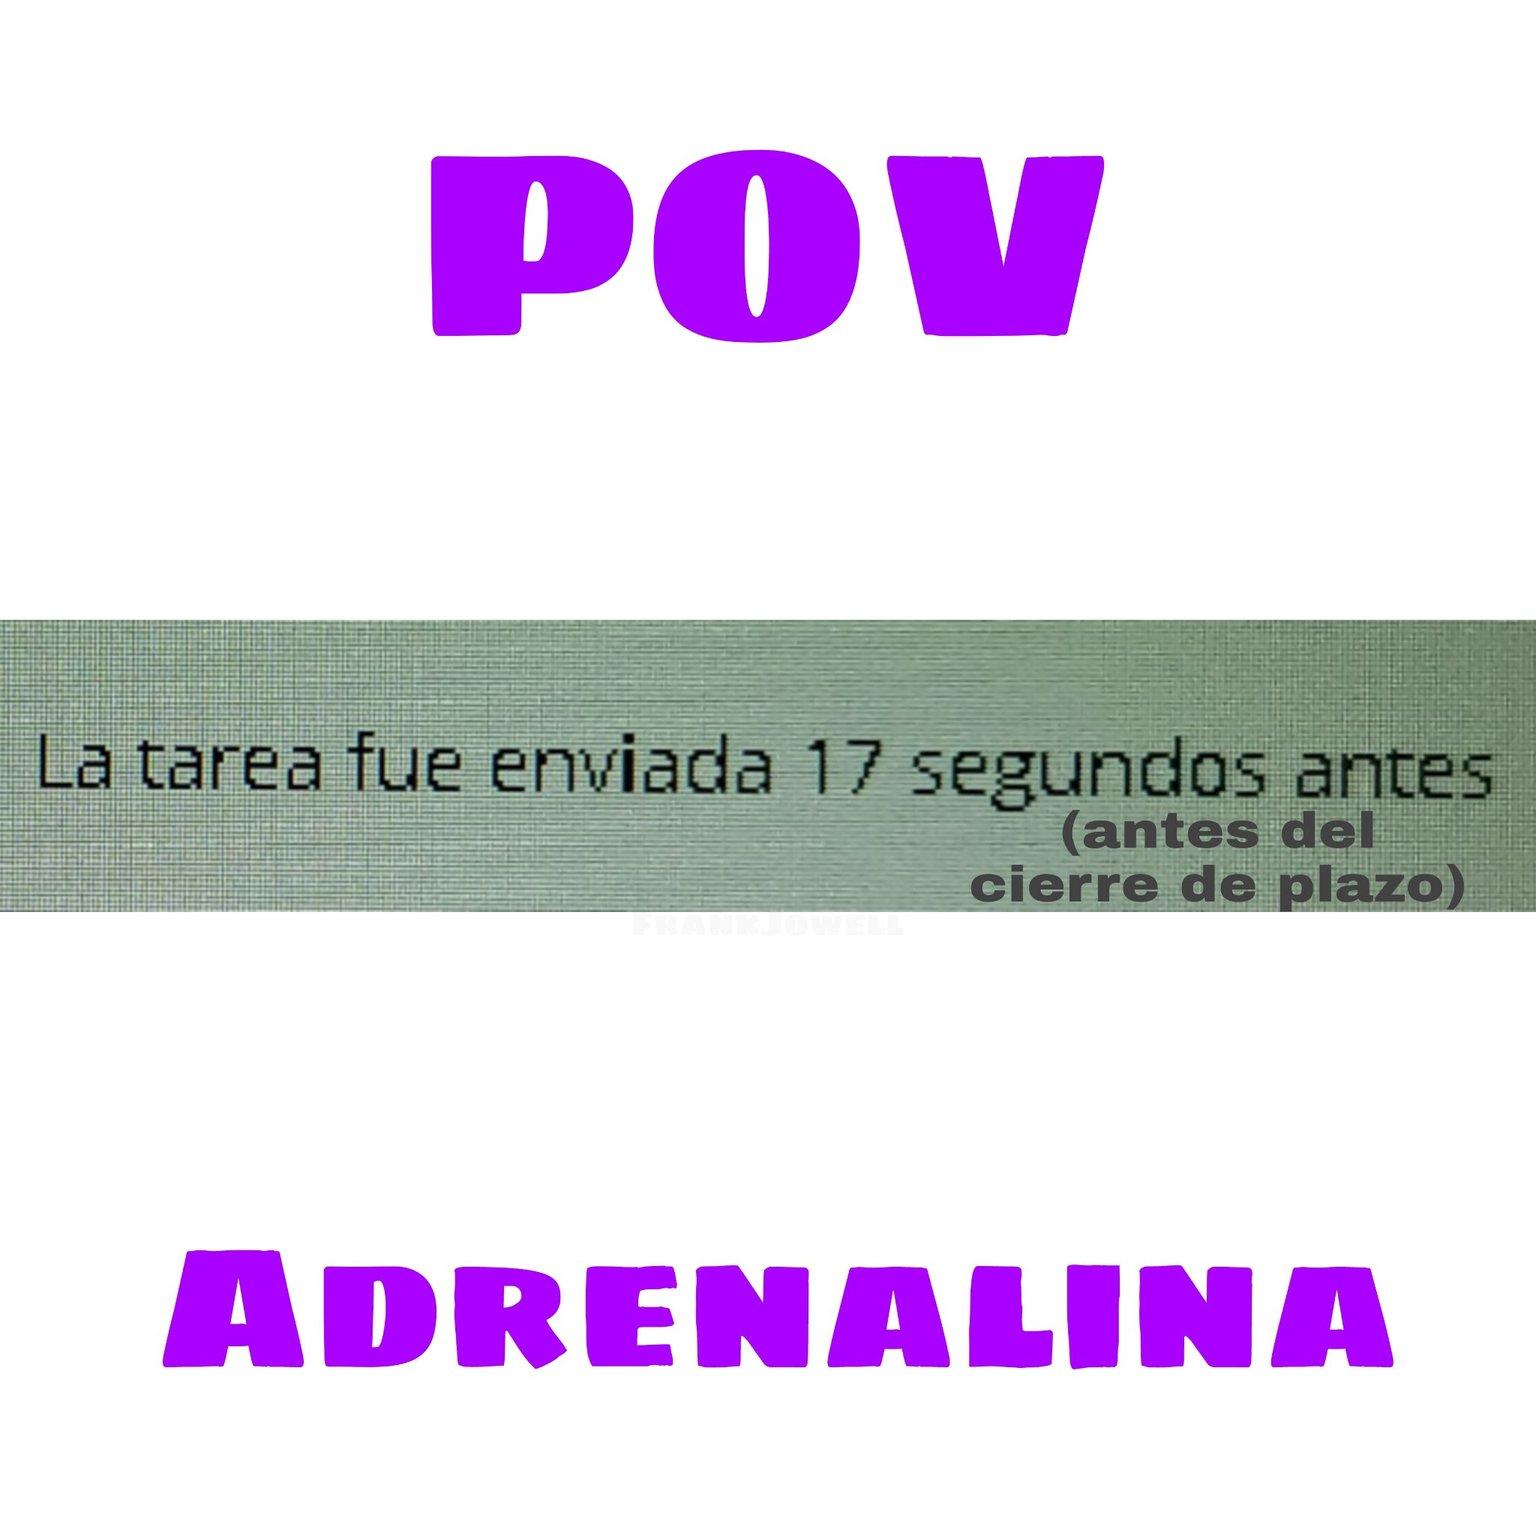 Adrenalina - meme